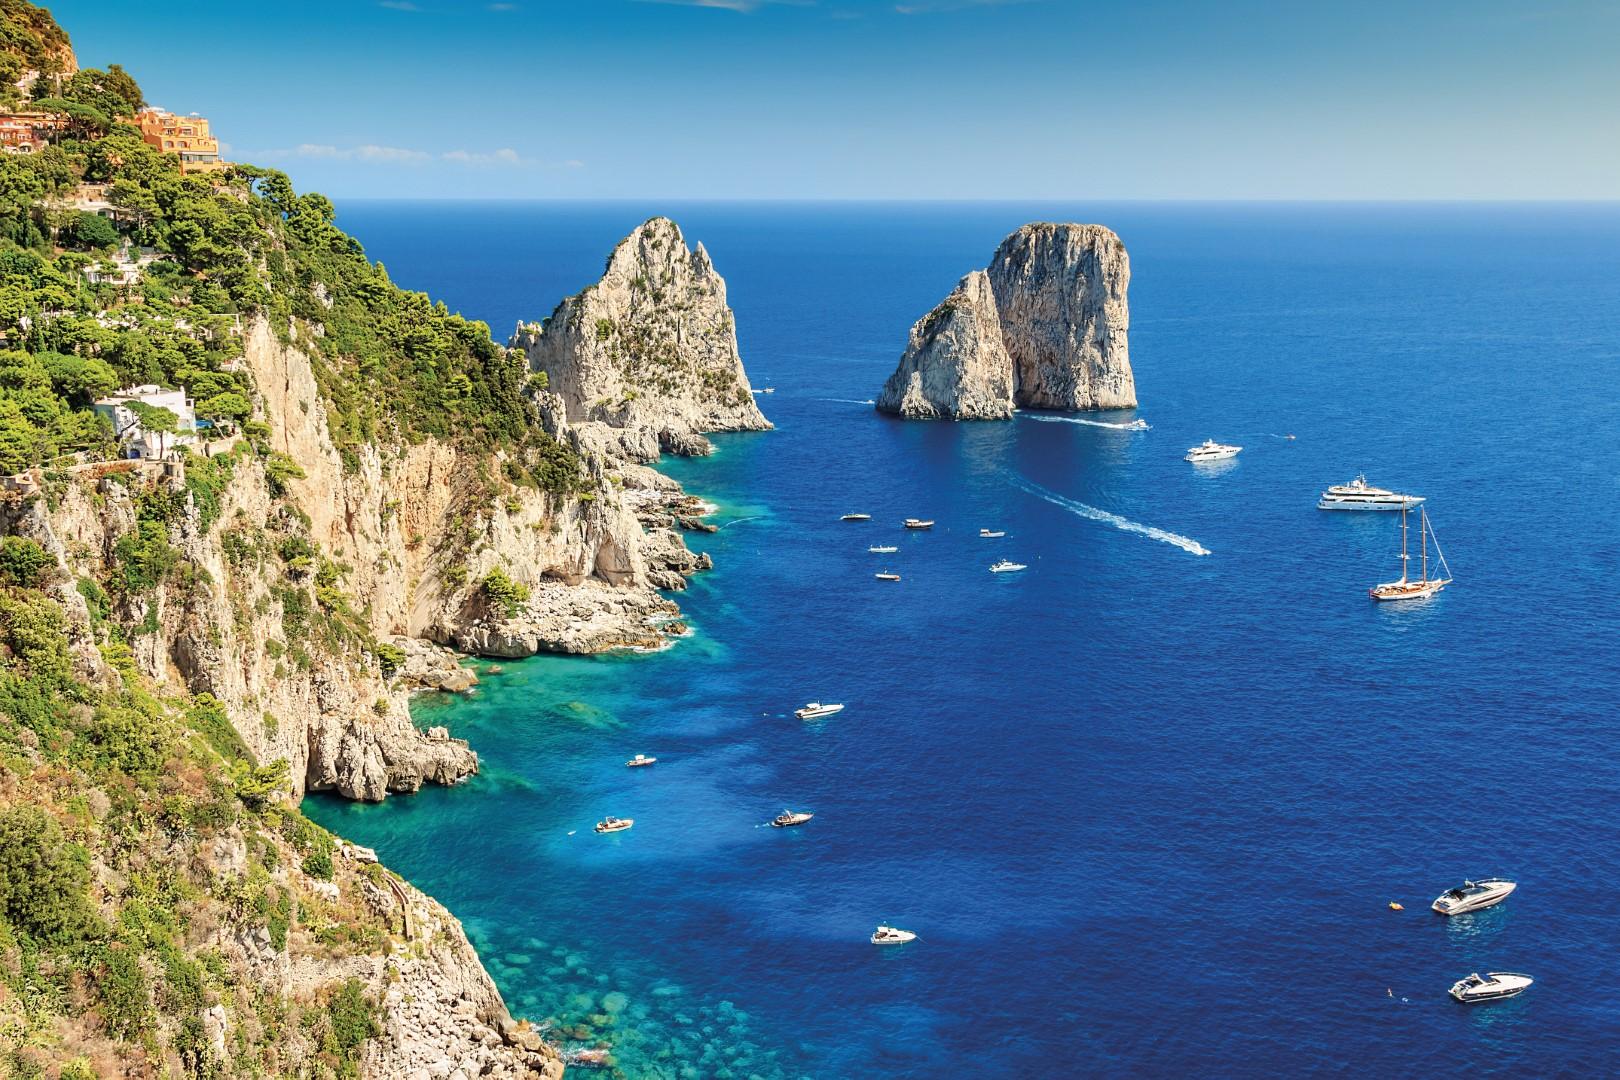 Řím - Neapol - Capri - Ischia (autobusem) #4